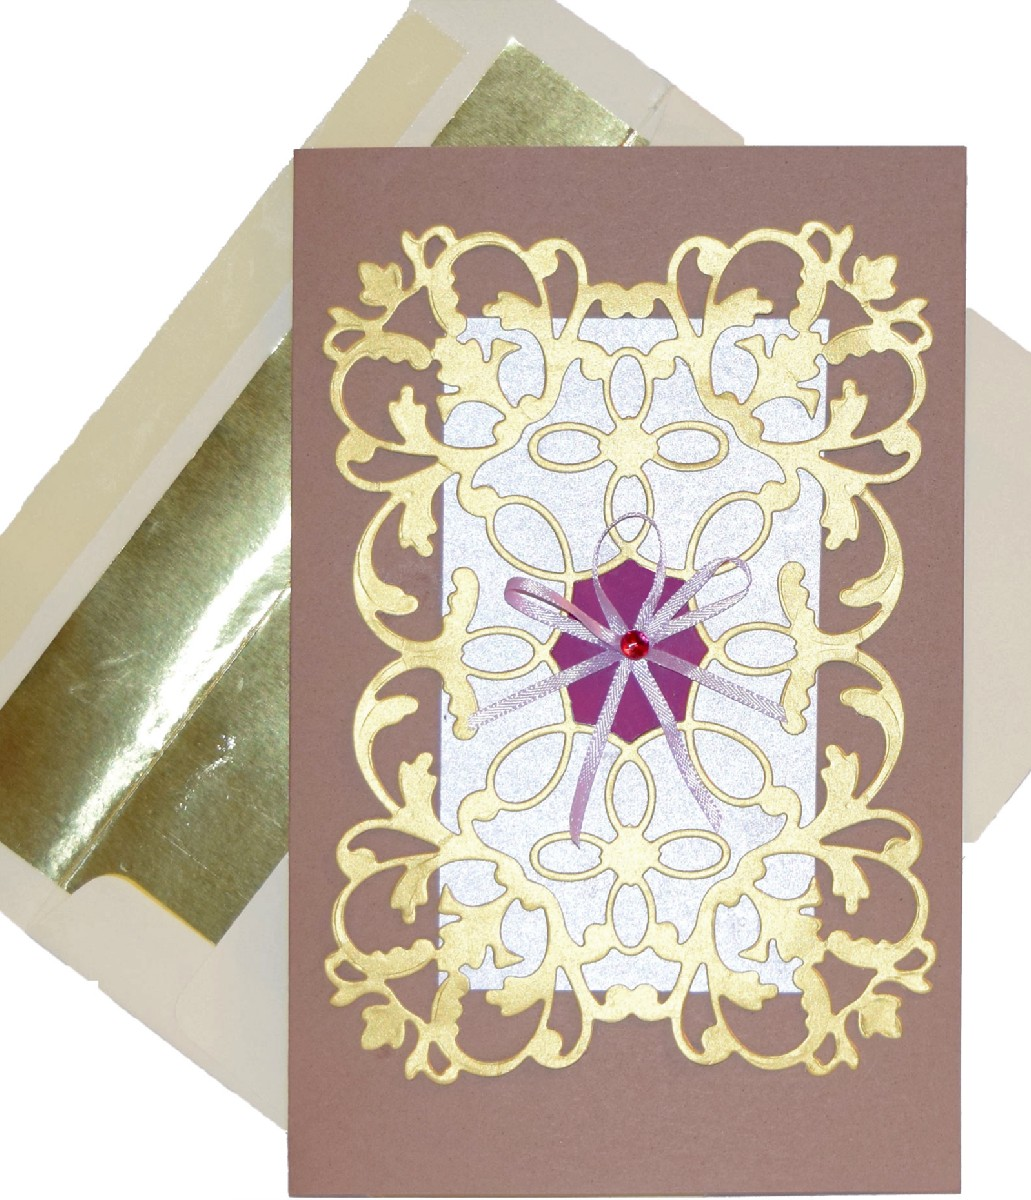 crush almond paper and flourish card design - Paper papers Filigree 2016 4 web - Crush Almond Paper and Flourish Card Design